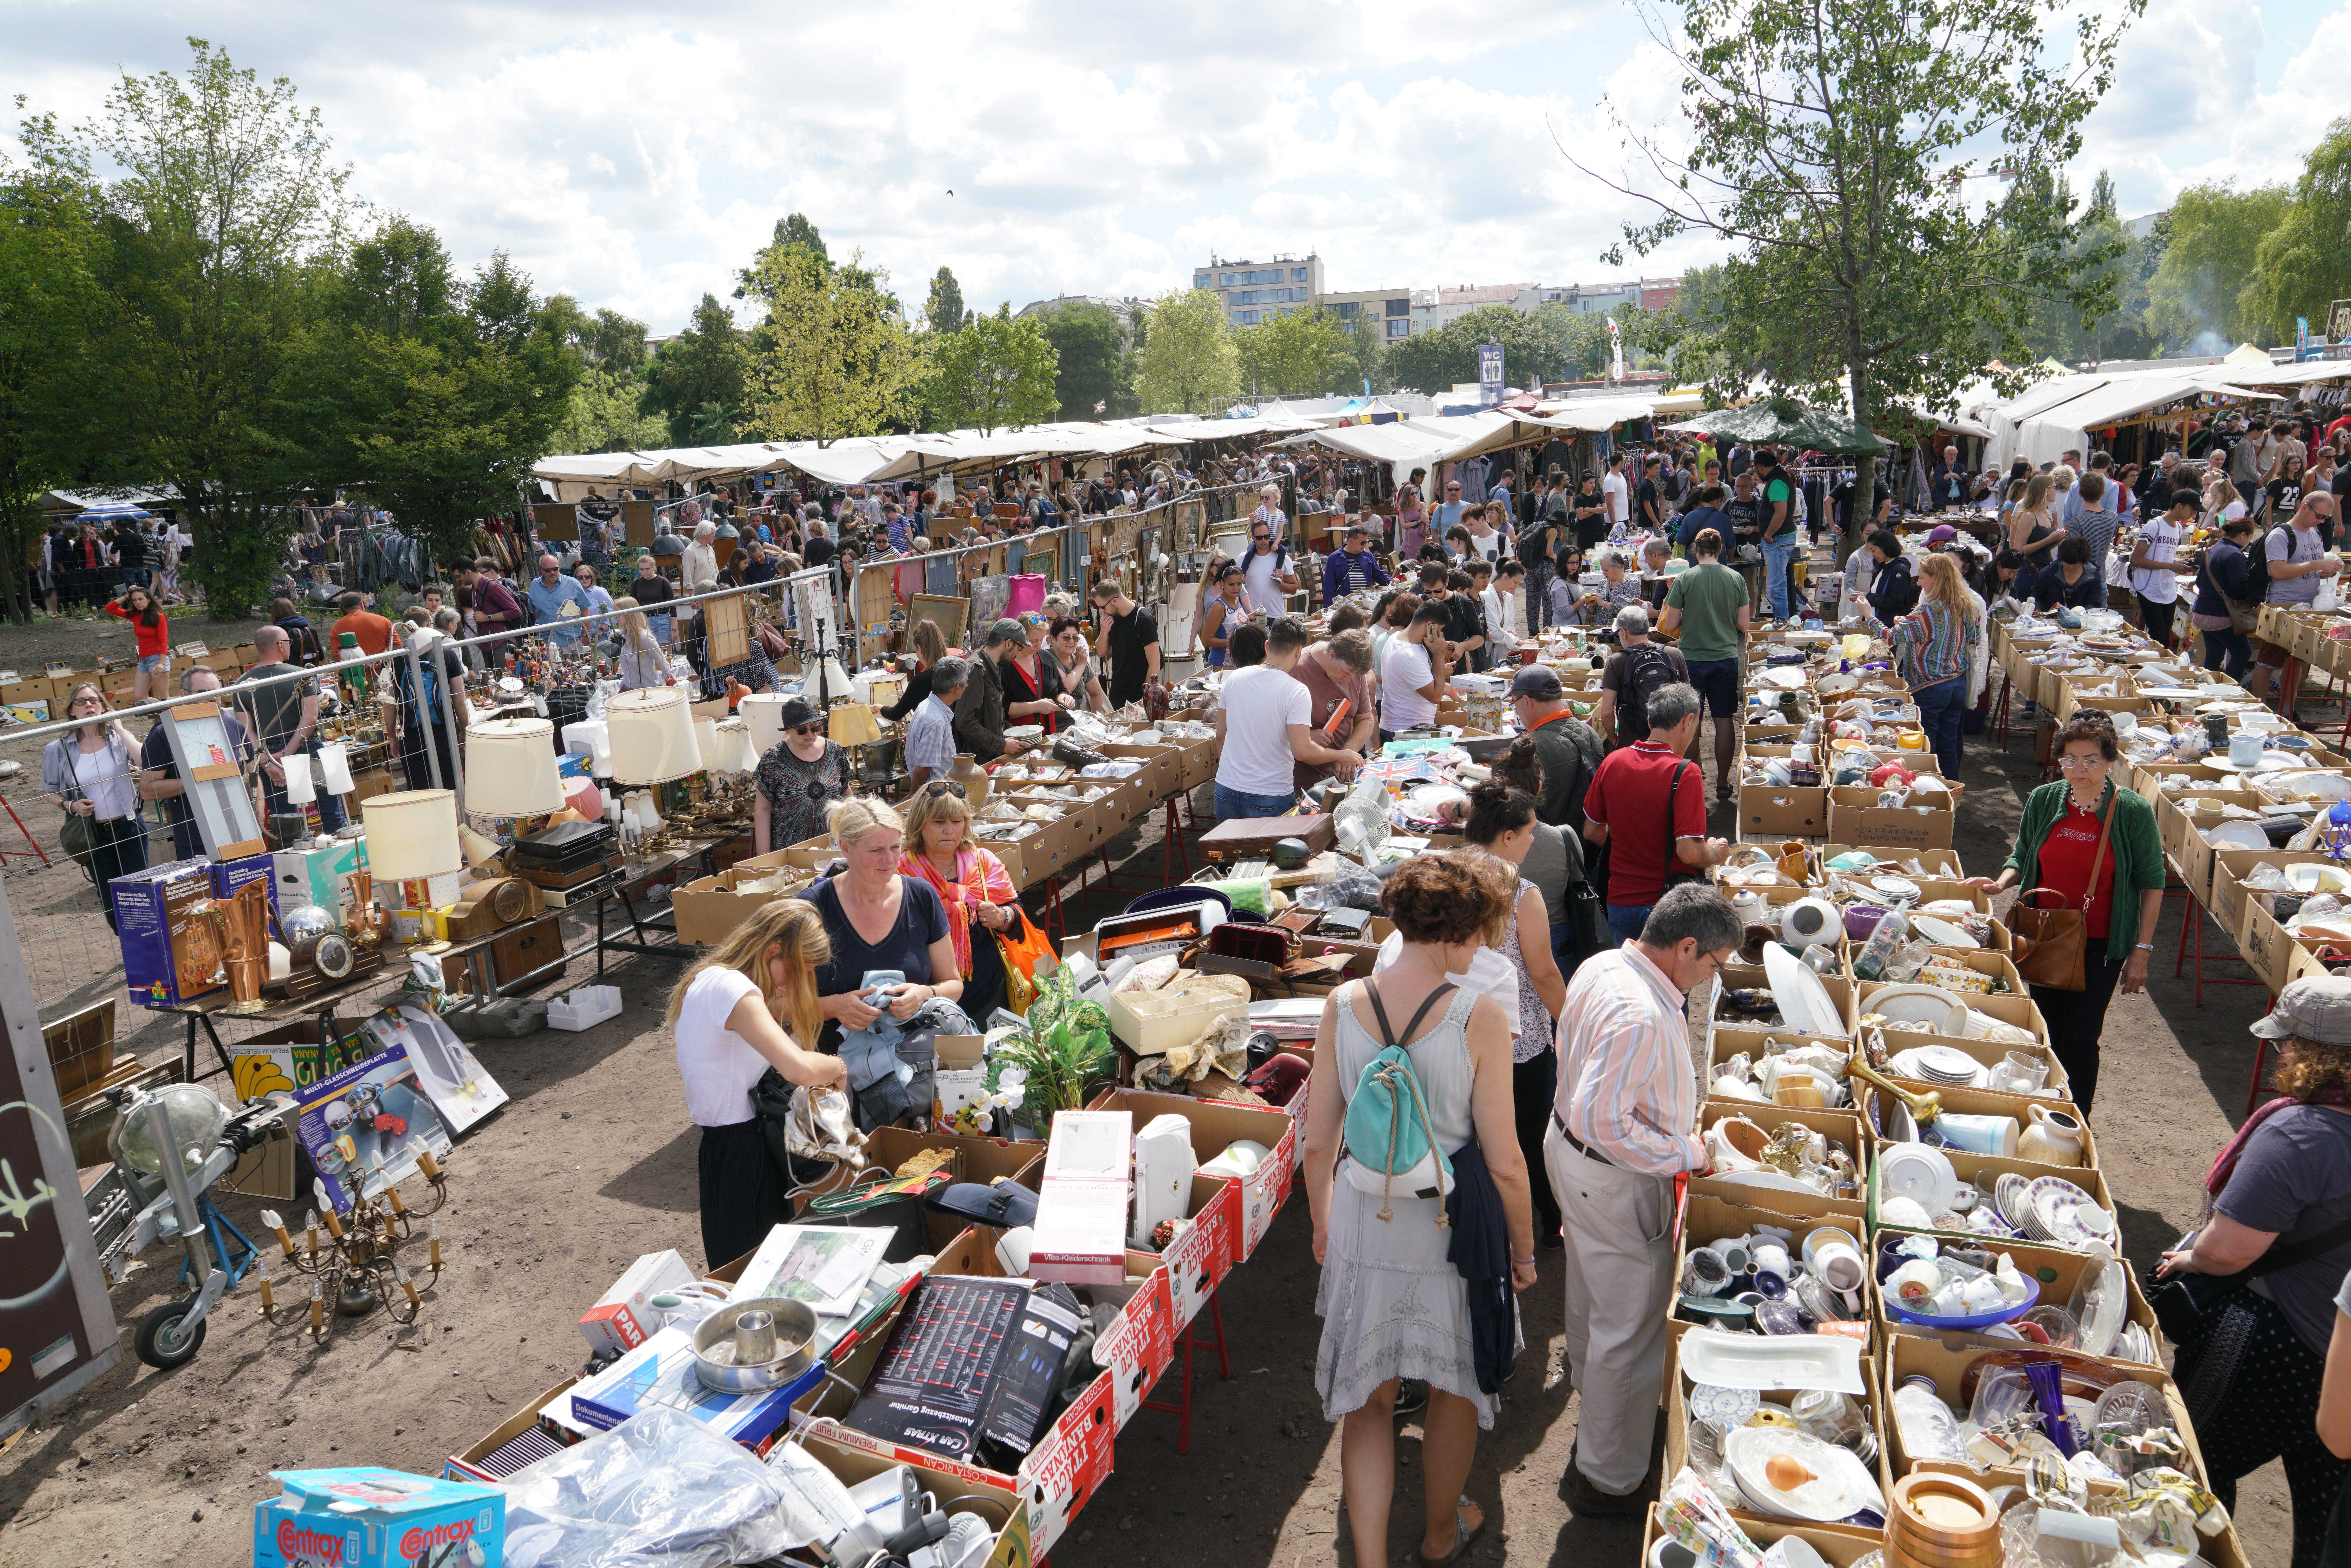 Mauerpark flea market in Prenzlauer Berg, Berlin